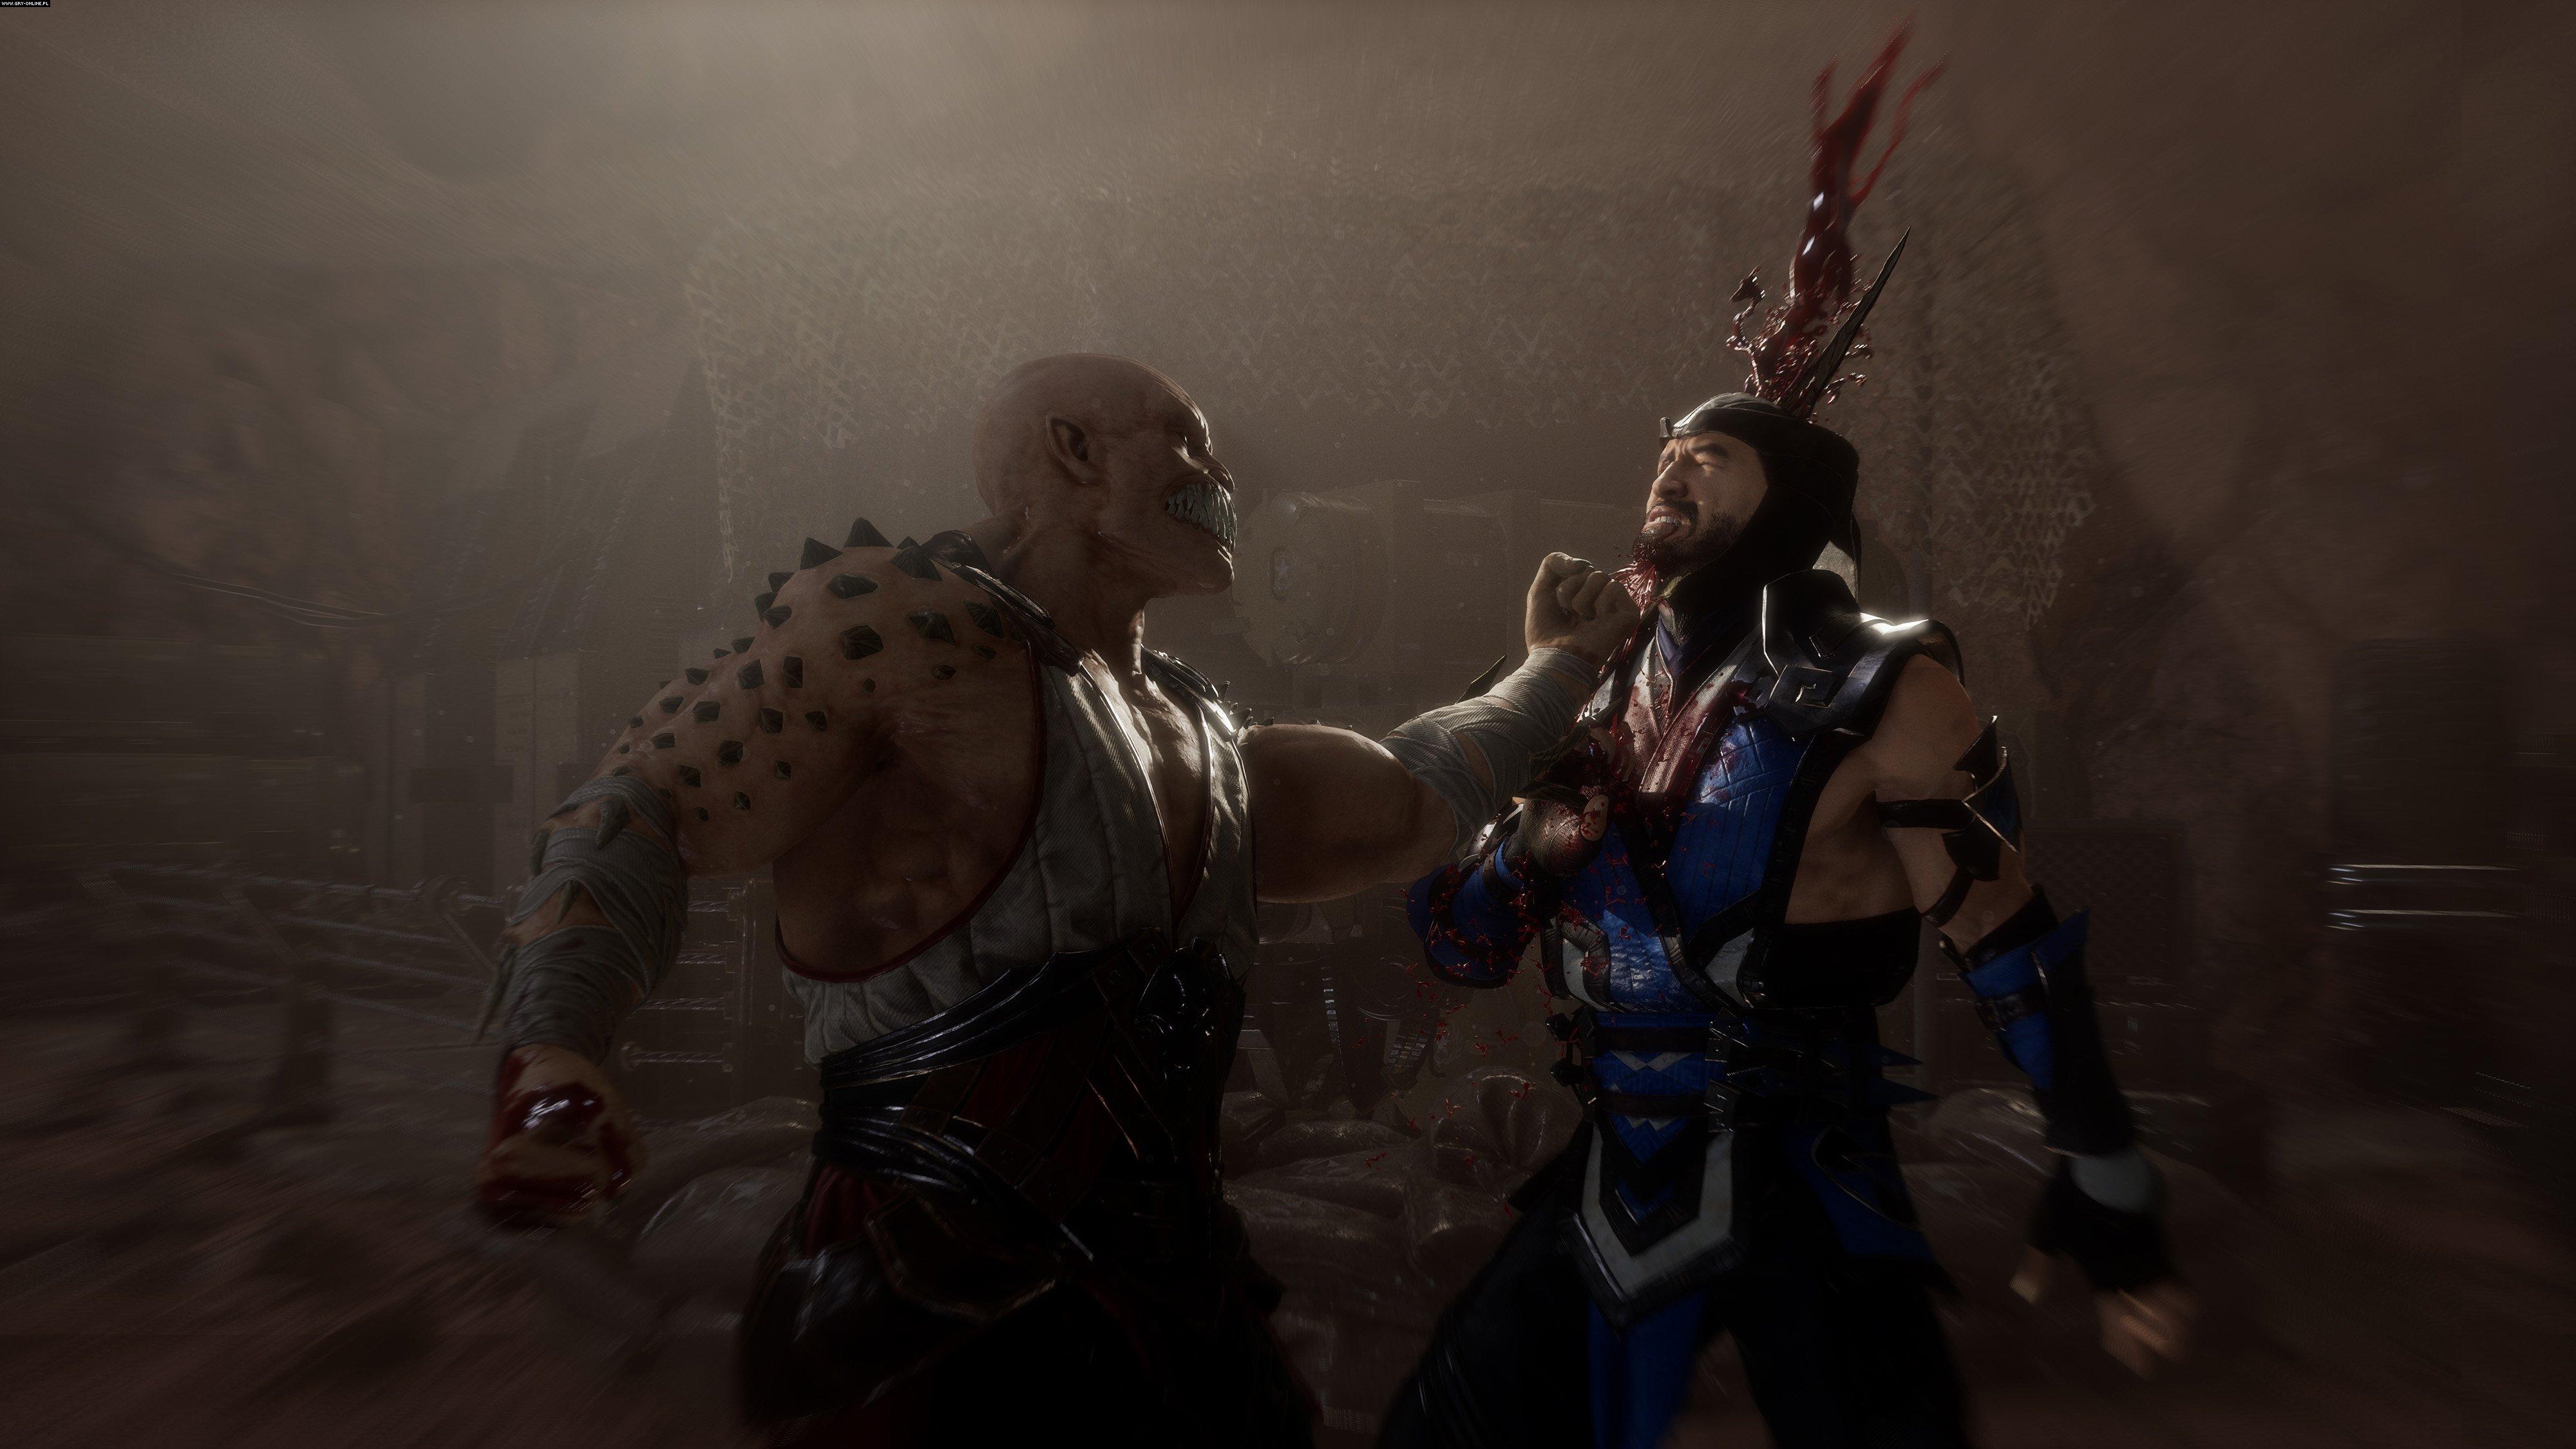 Mortal Kombat 11 download PC | Bandits Game - Download and hack